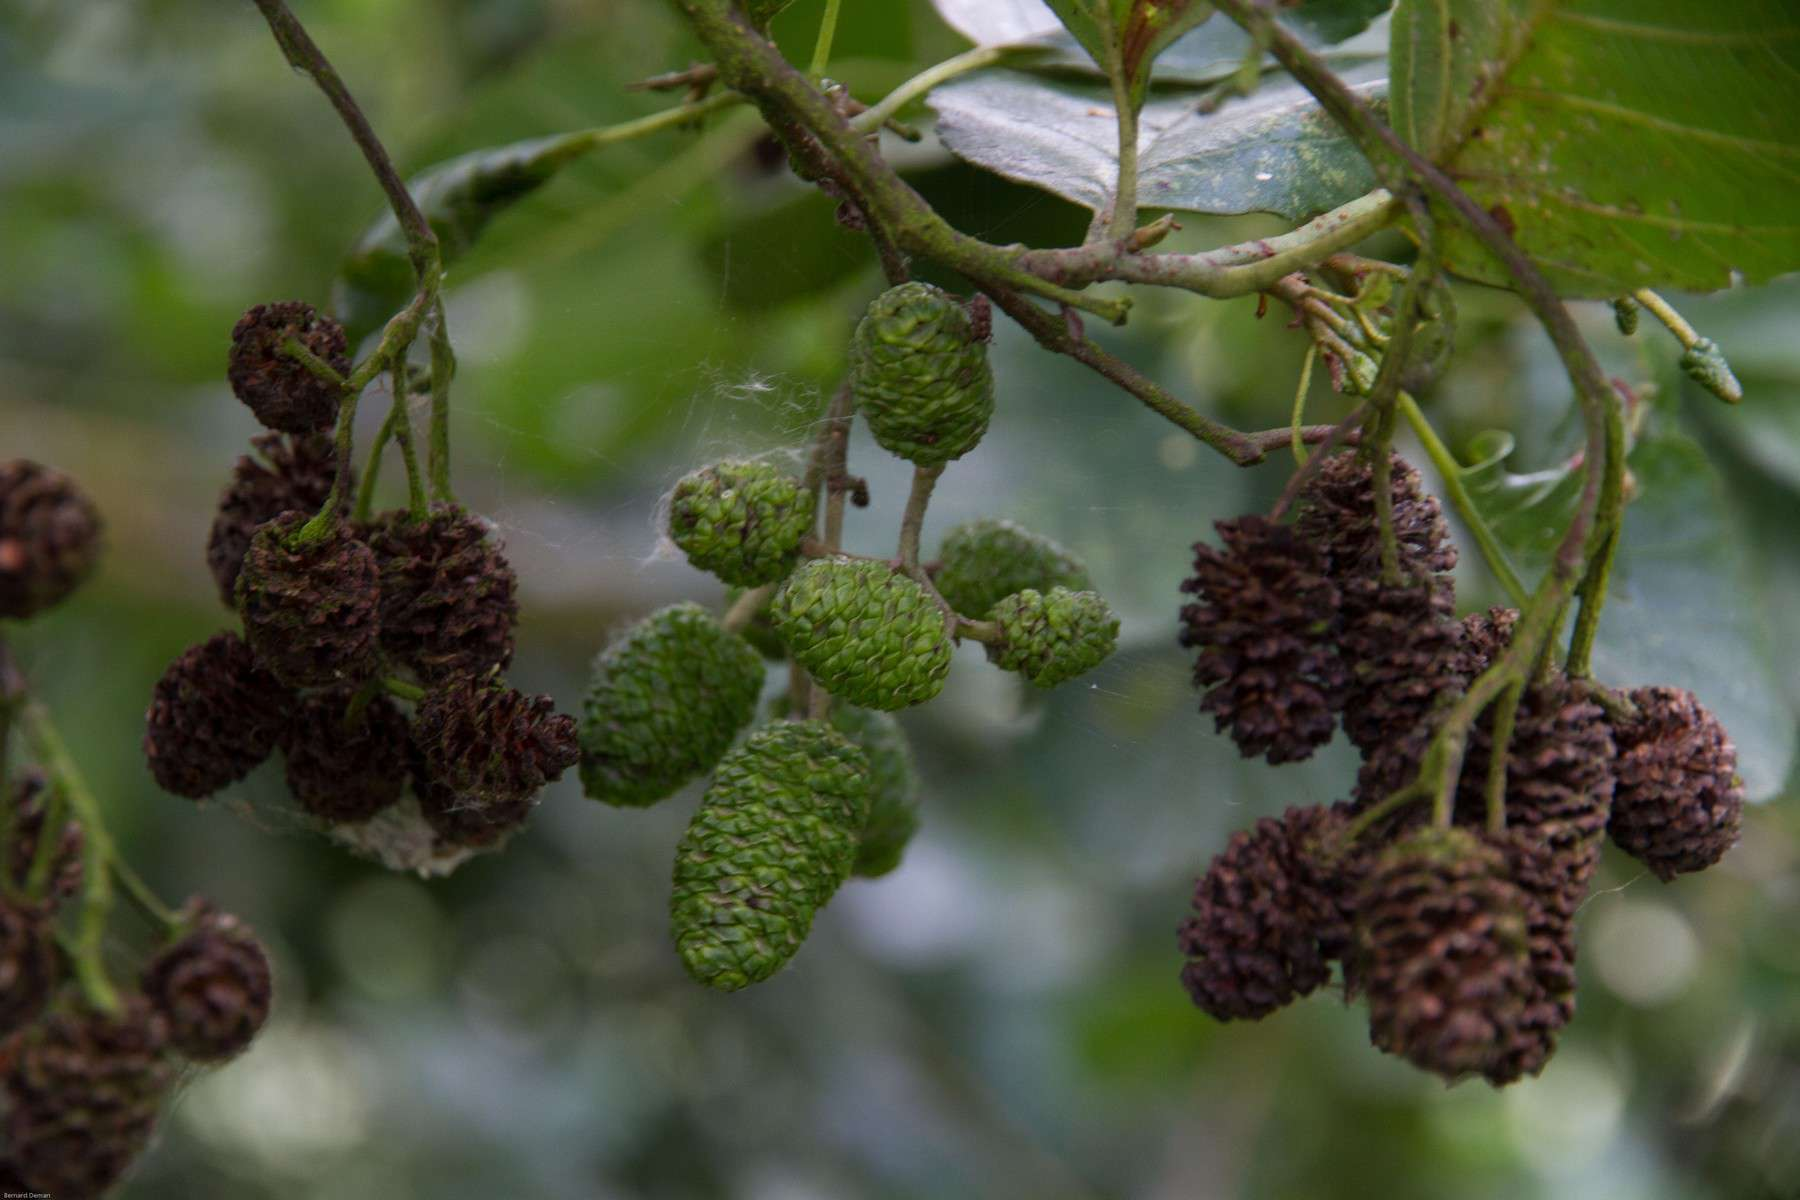 Aulne glutineux - frutis (Crédits: Bernard Deman)